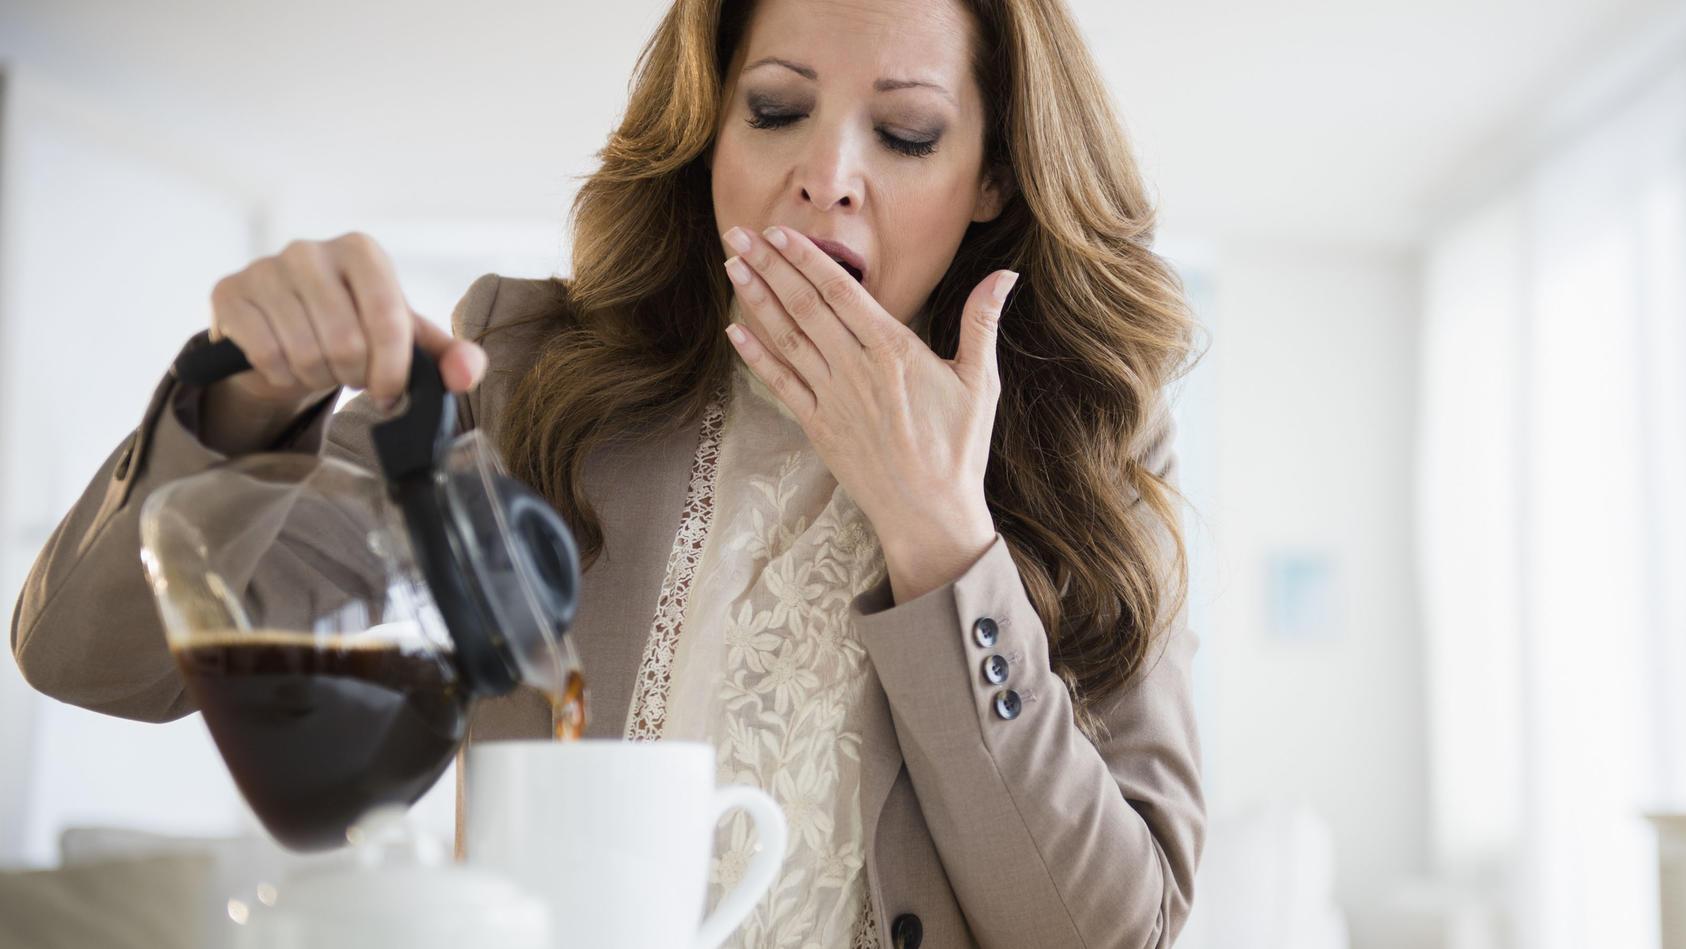 Gähnende Frau trinkt Kaffee.